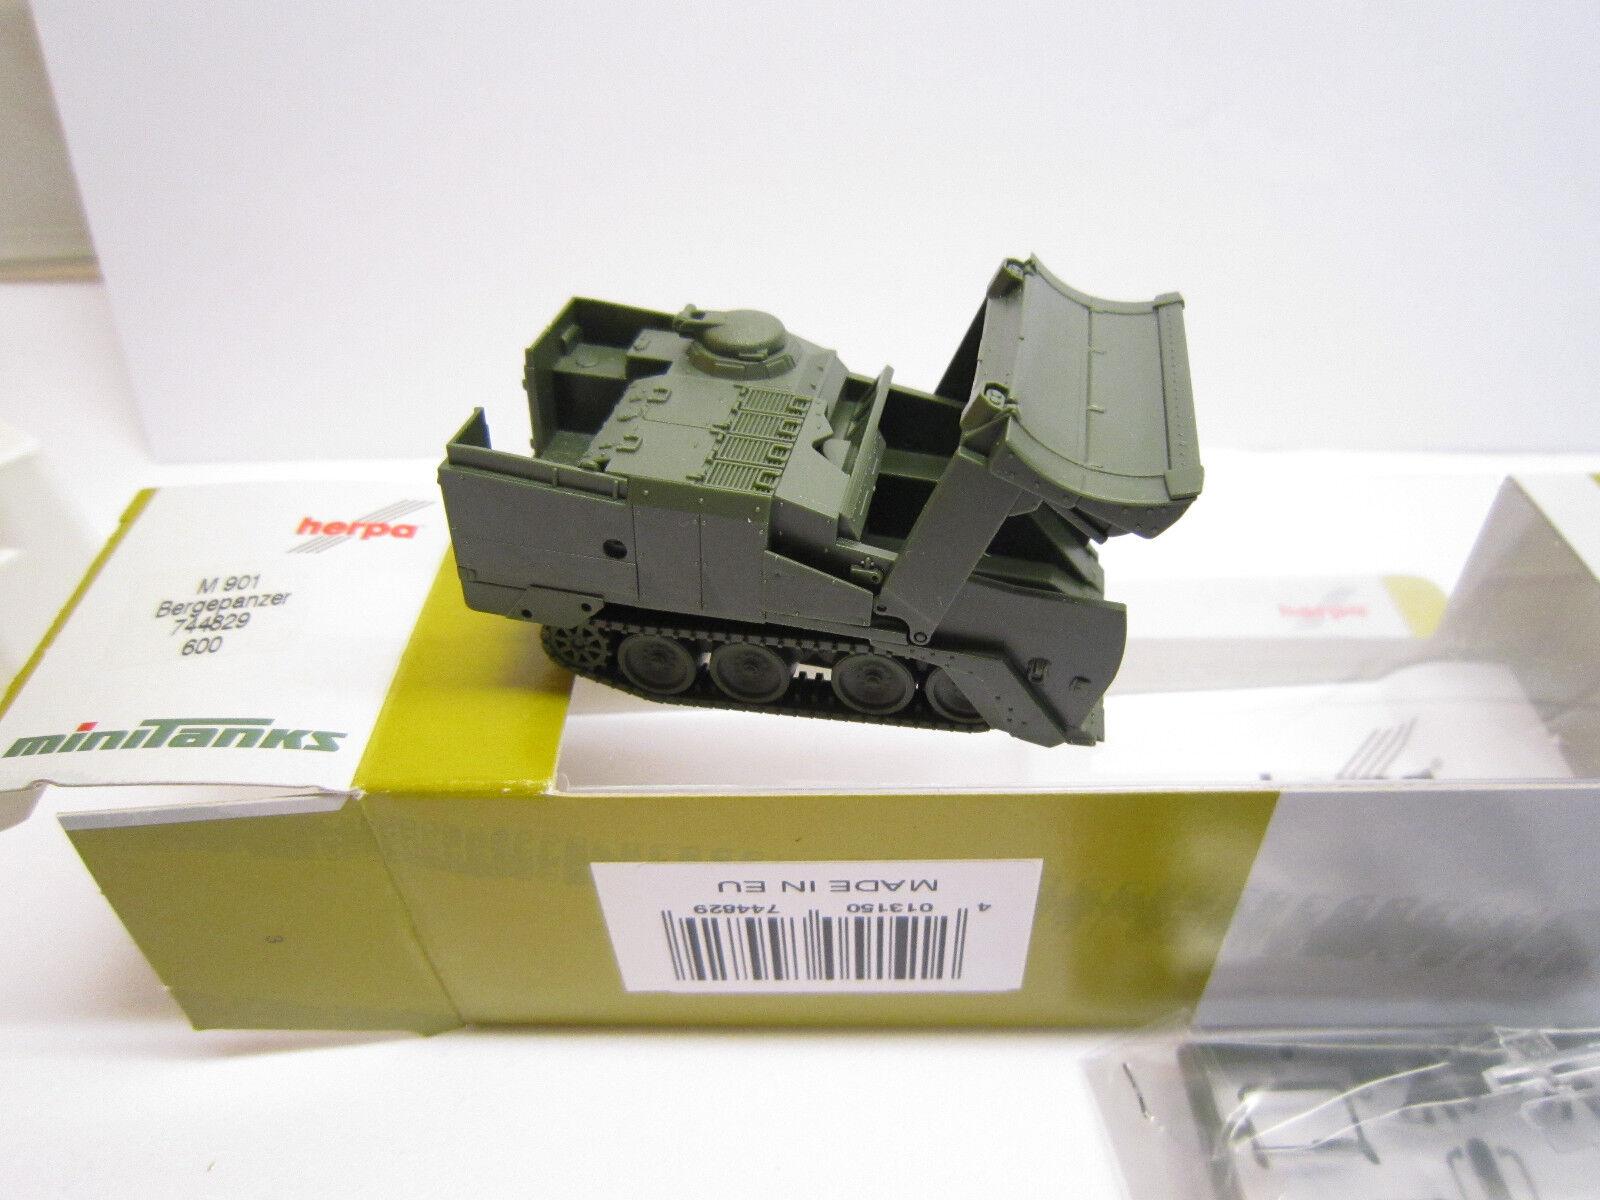 NEU /& OVP Roco 600 Herpa Minitanks 744829 Panzer Bergepanzer M901 US Army